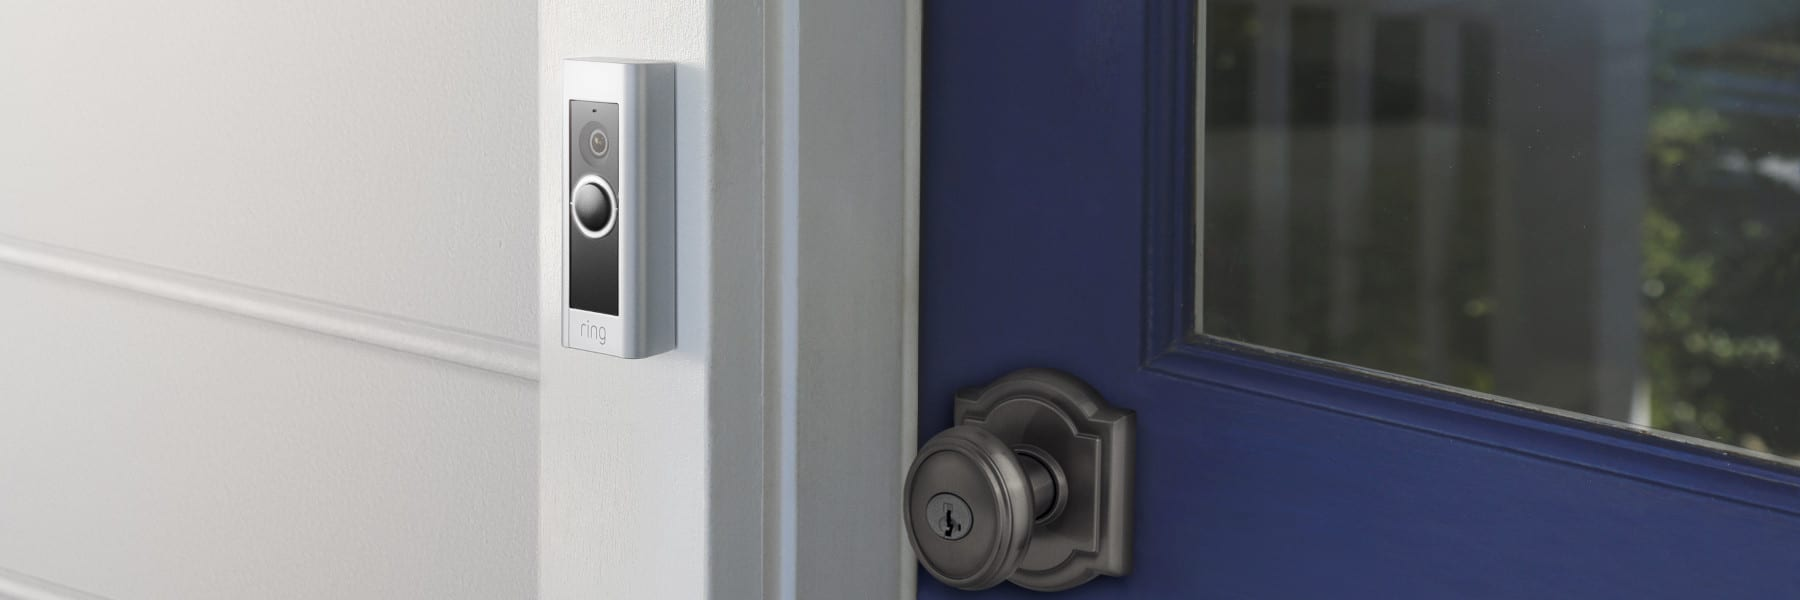 video t rklingel ring soll homekit unterst tzung erhalten. Black Bedroom Furniture Sets. Home Design Ideas